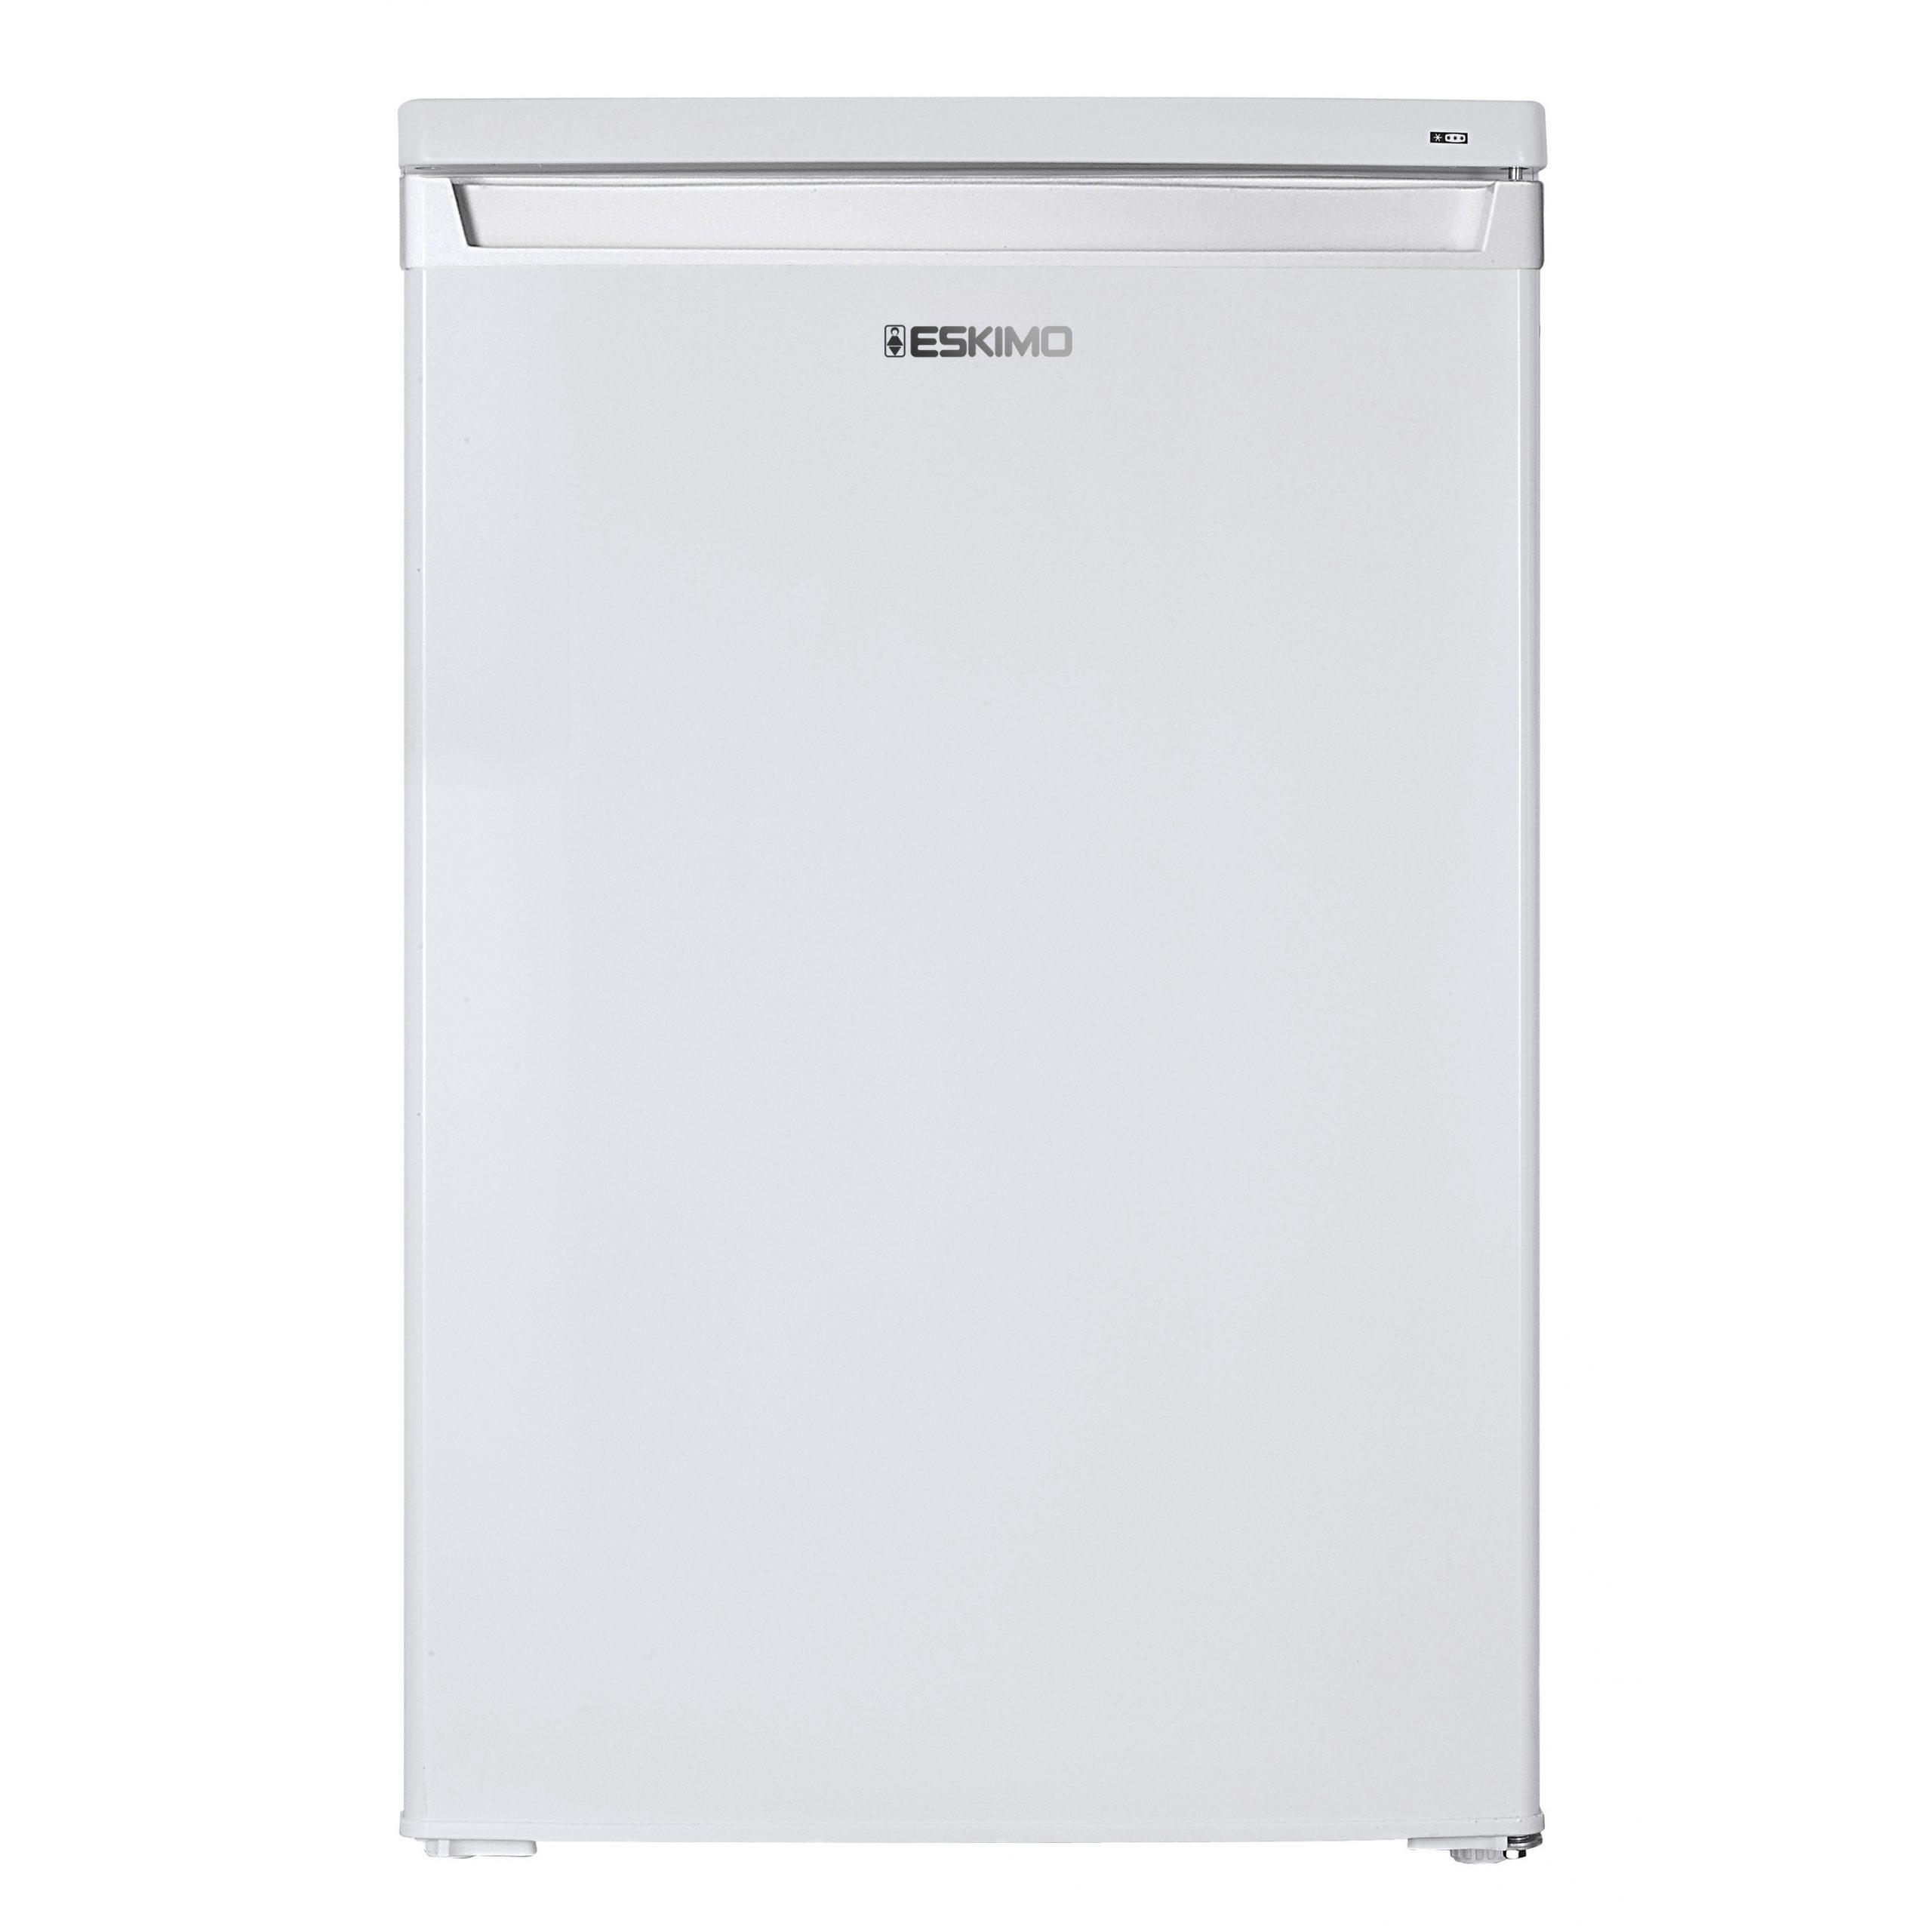 Eskimo Μονόπορτο Ψυγείο ES R1D118SFW